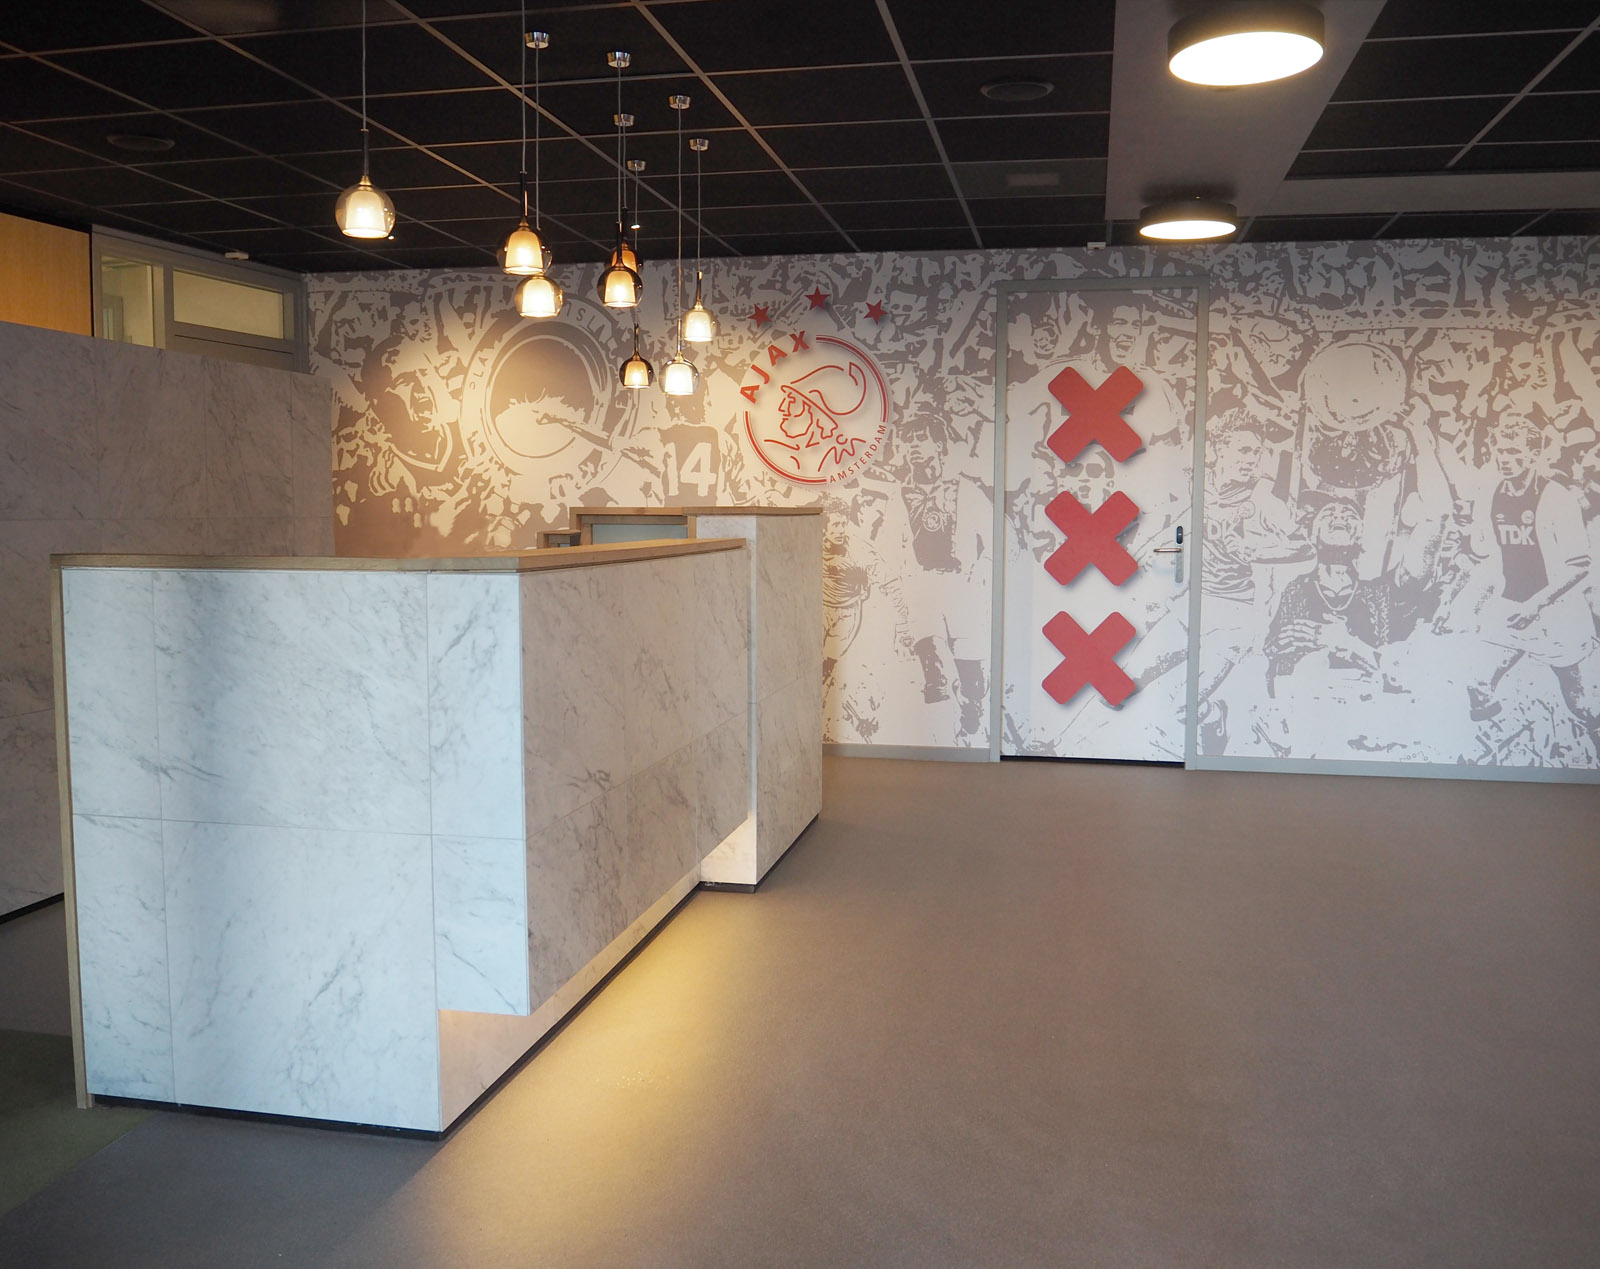 lobby-ajax-amsterdam-arena-fotowand-print-jeroendenijs